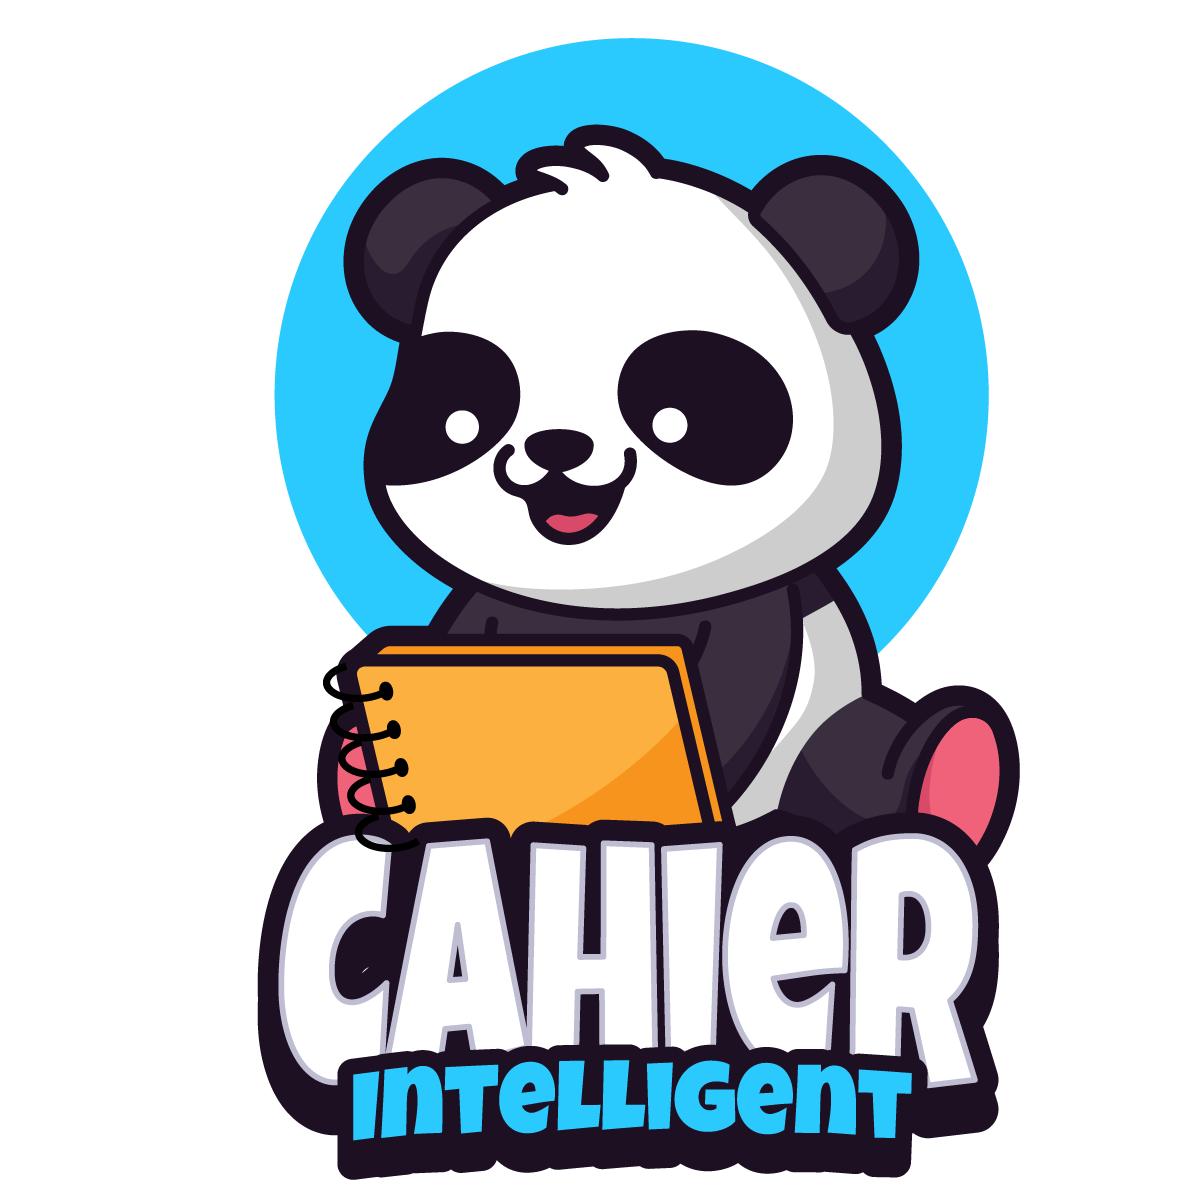 Logo cahier intelligent 1200x1200